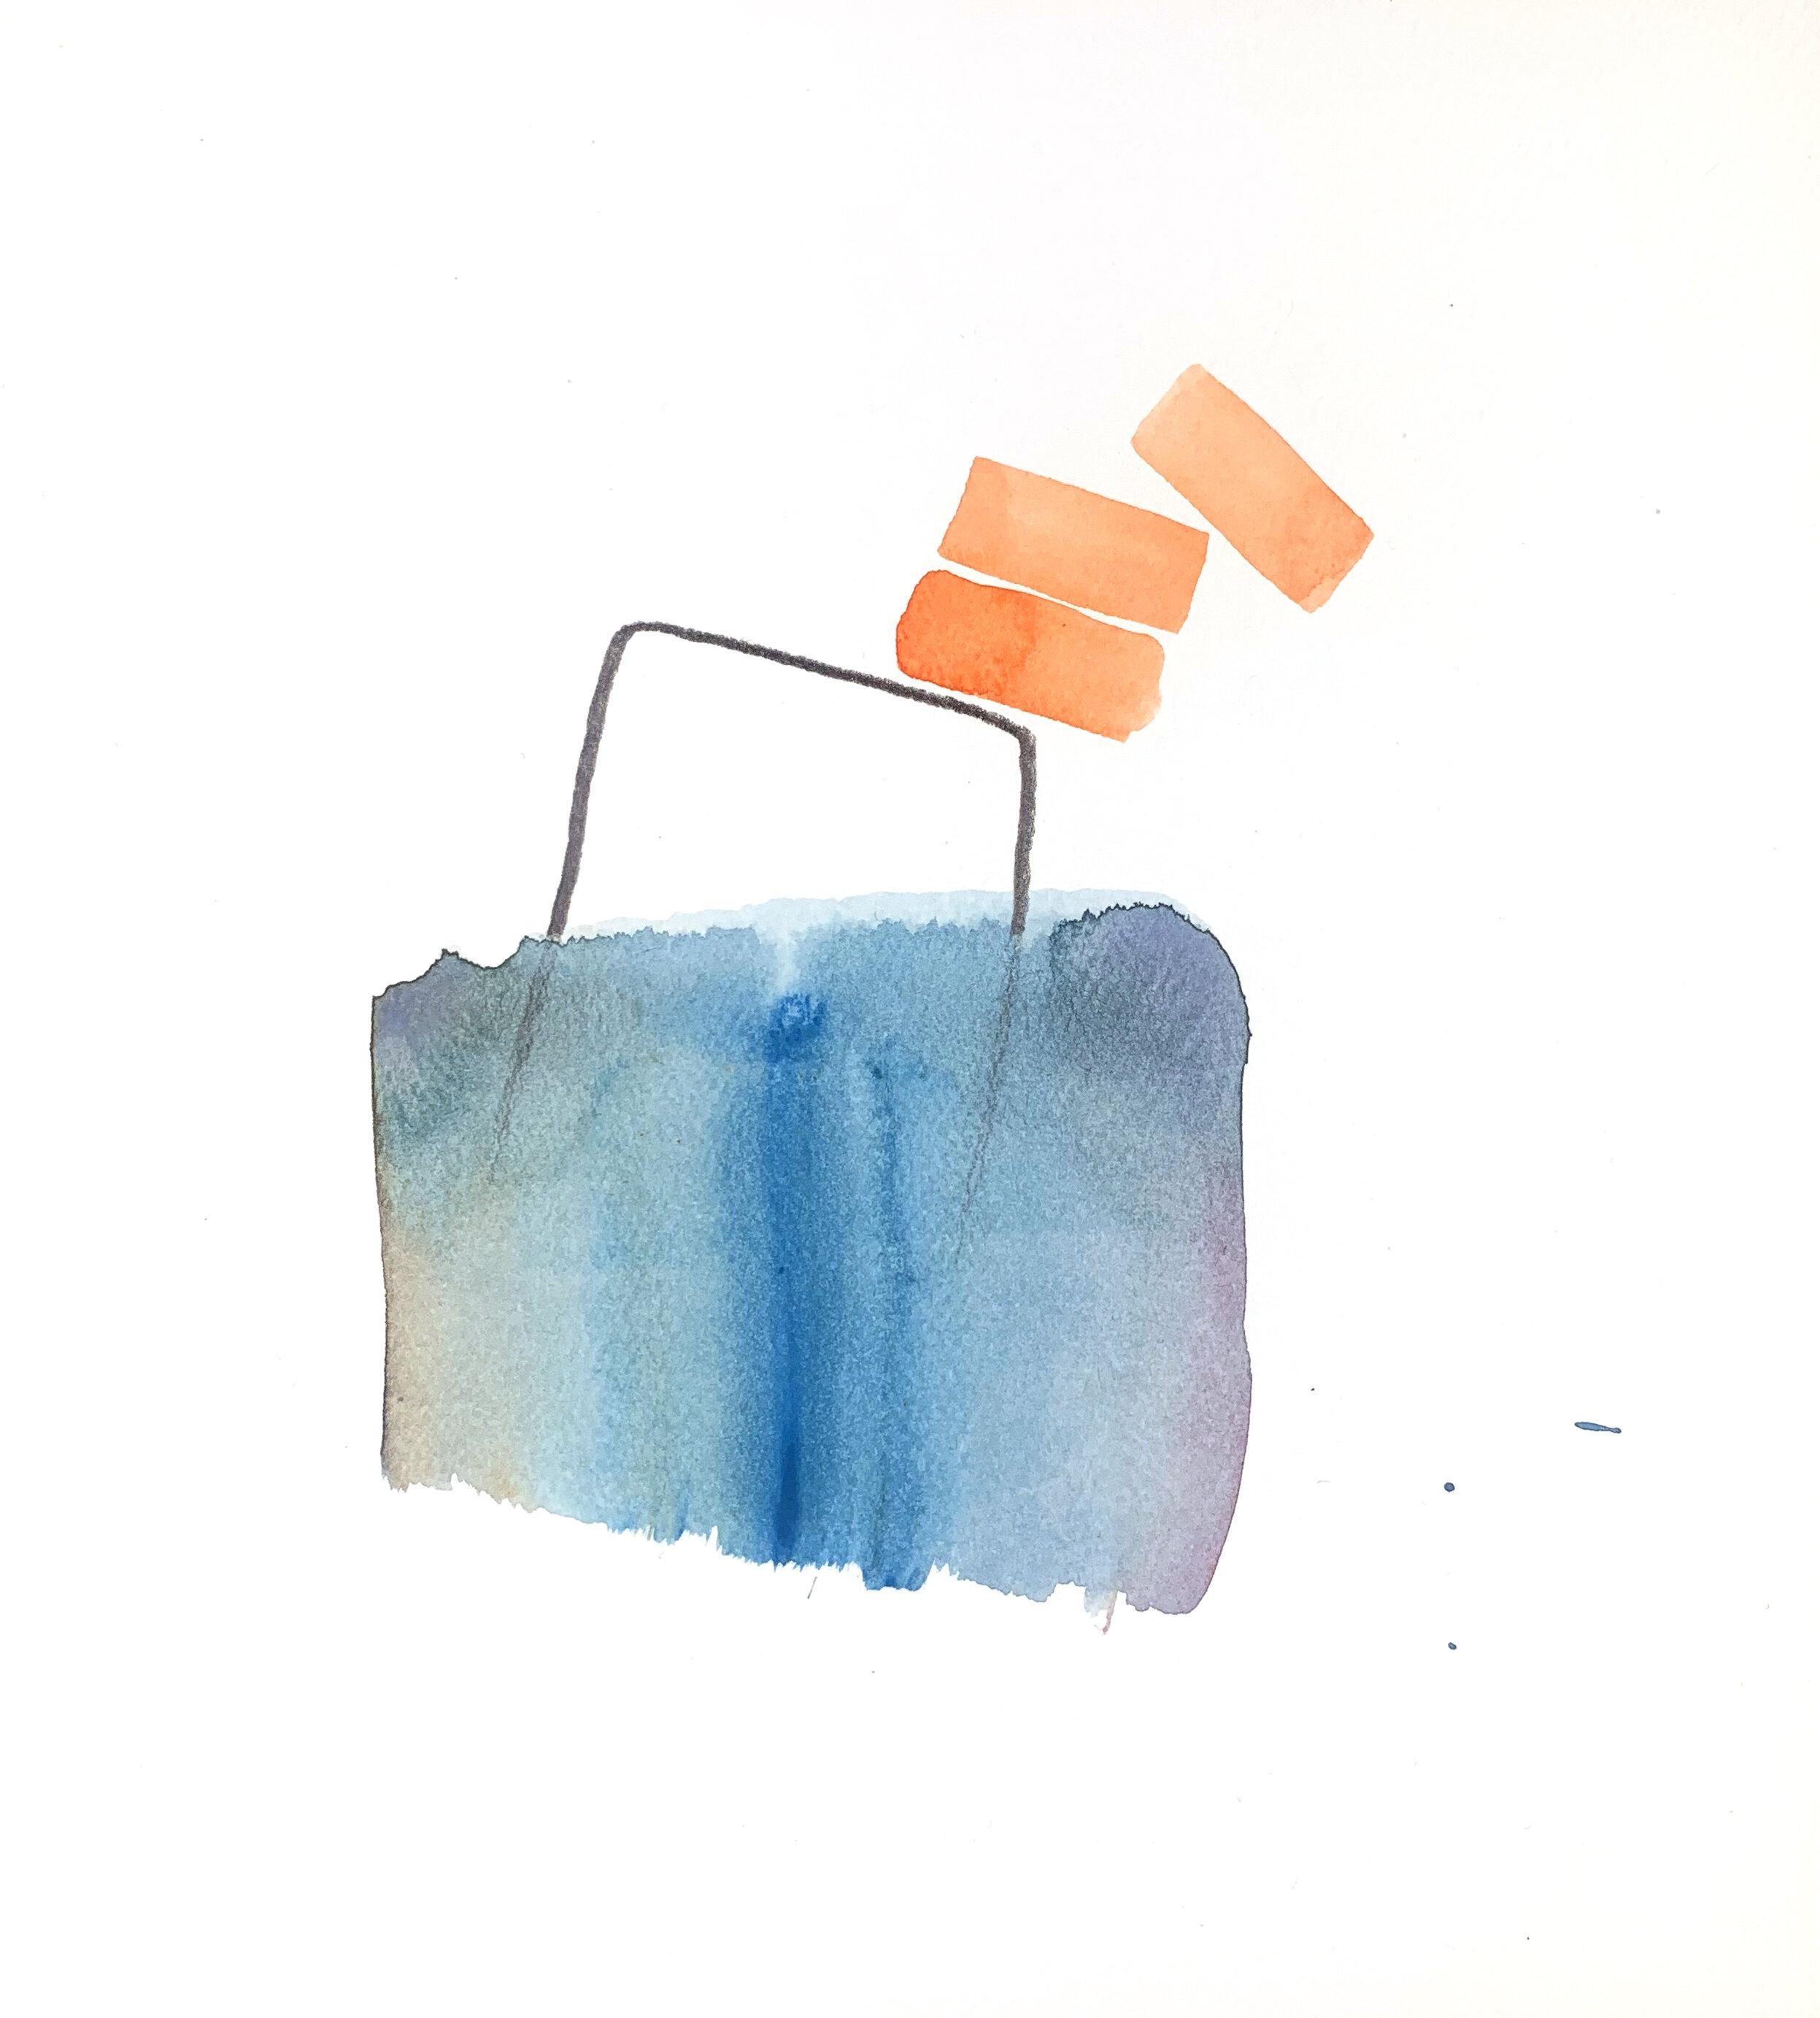 Wesley Berg UntitledB290 2019 Gouache and Graphite on Paper 7x7 .jpg